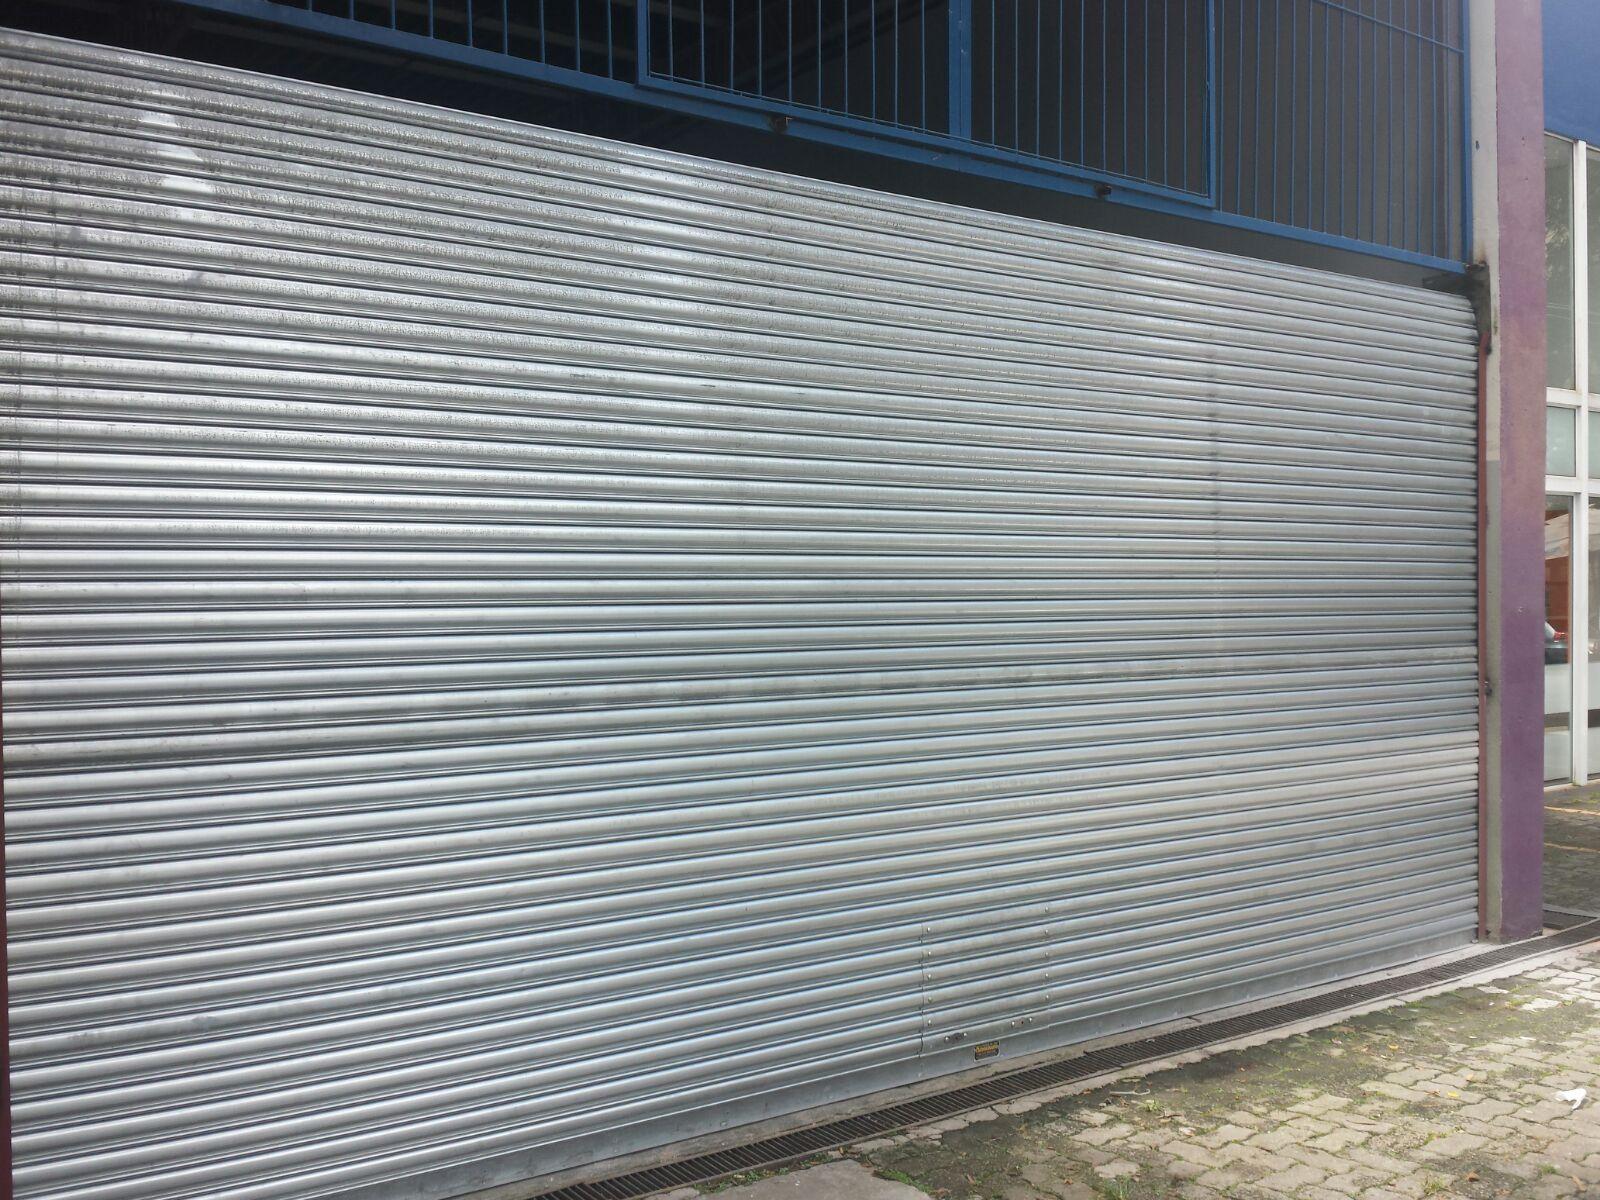 porta de enrolar - SP 99944-2493 Porta Automática de Enrolar